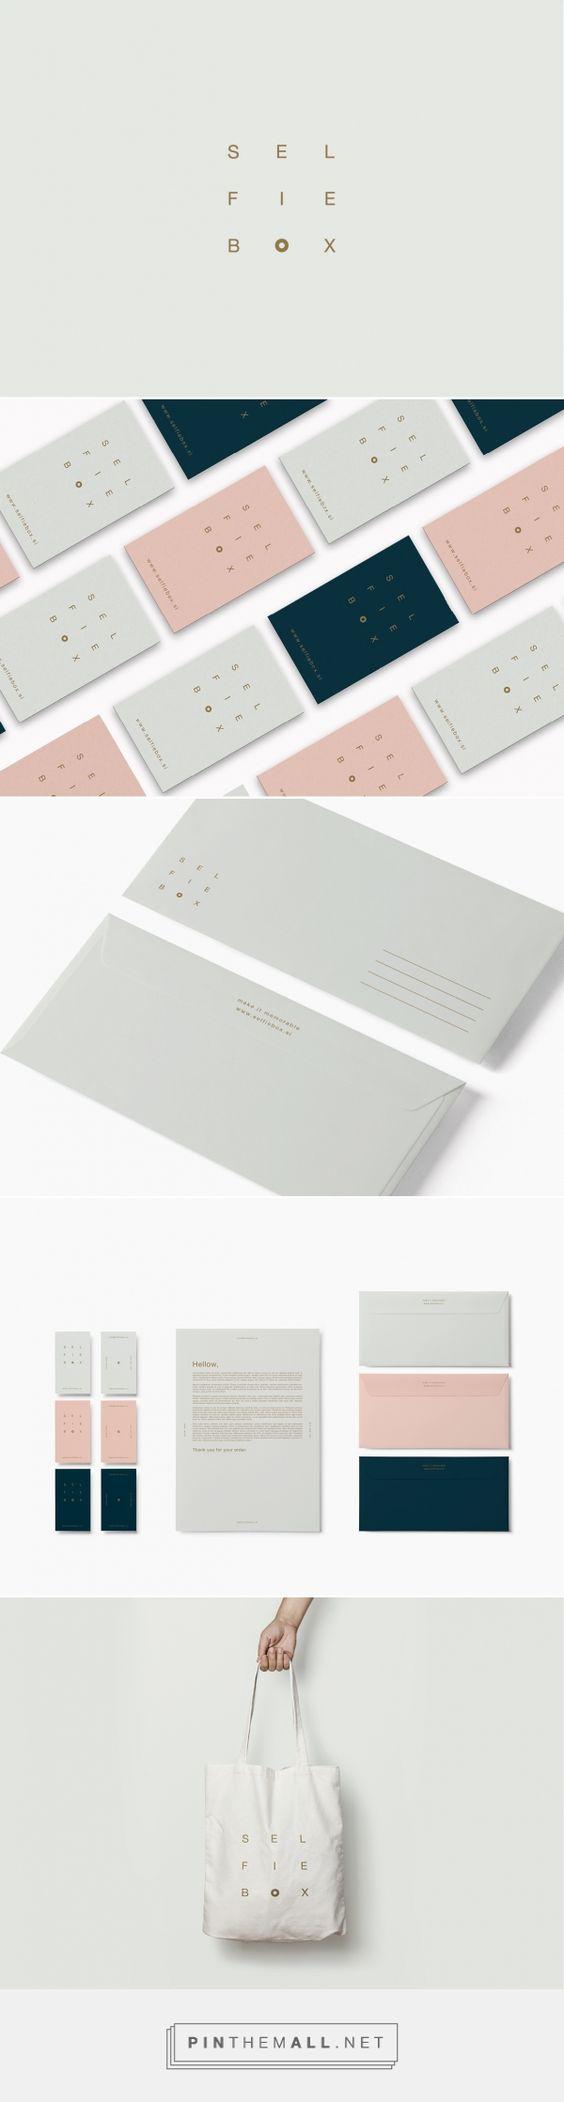 Selfie Box Branding by WeDesignStuff | Fivestar Branding – Design and Branding Agency & Inspiration Gallery